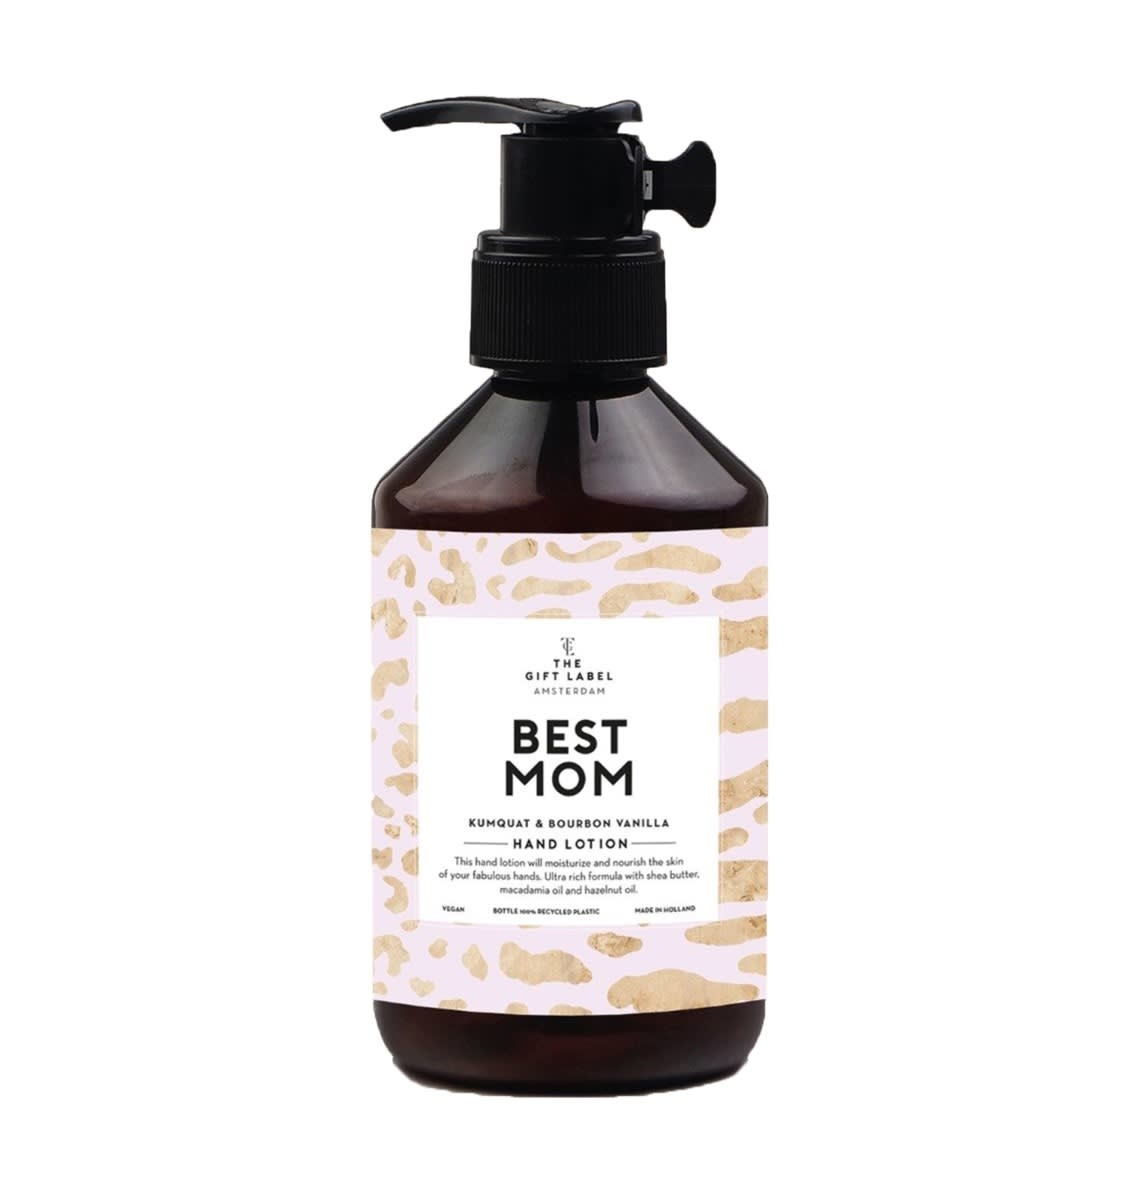 HandLotion Best Mom - The Gift Label